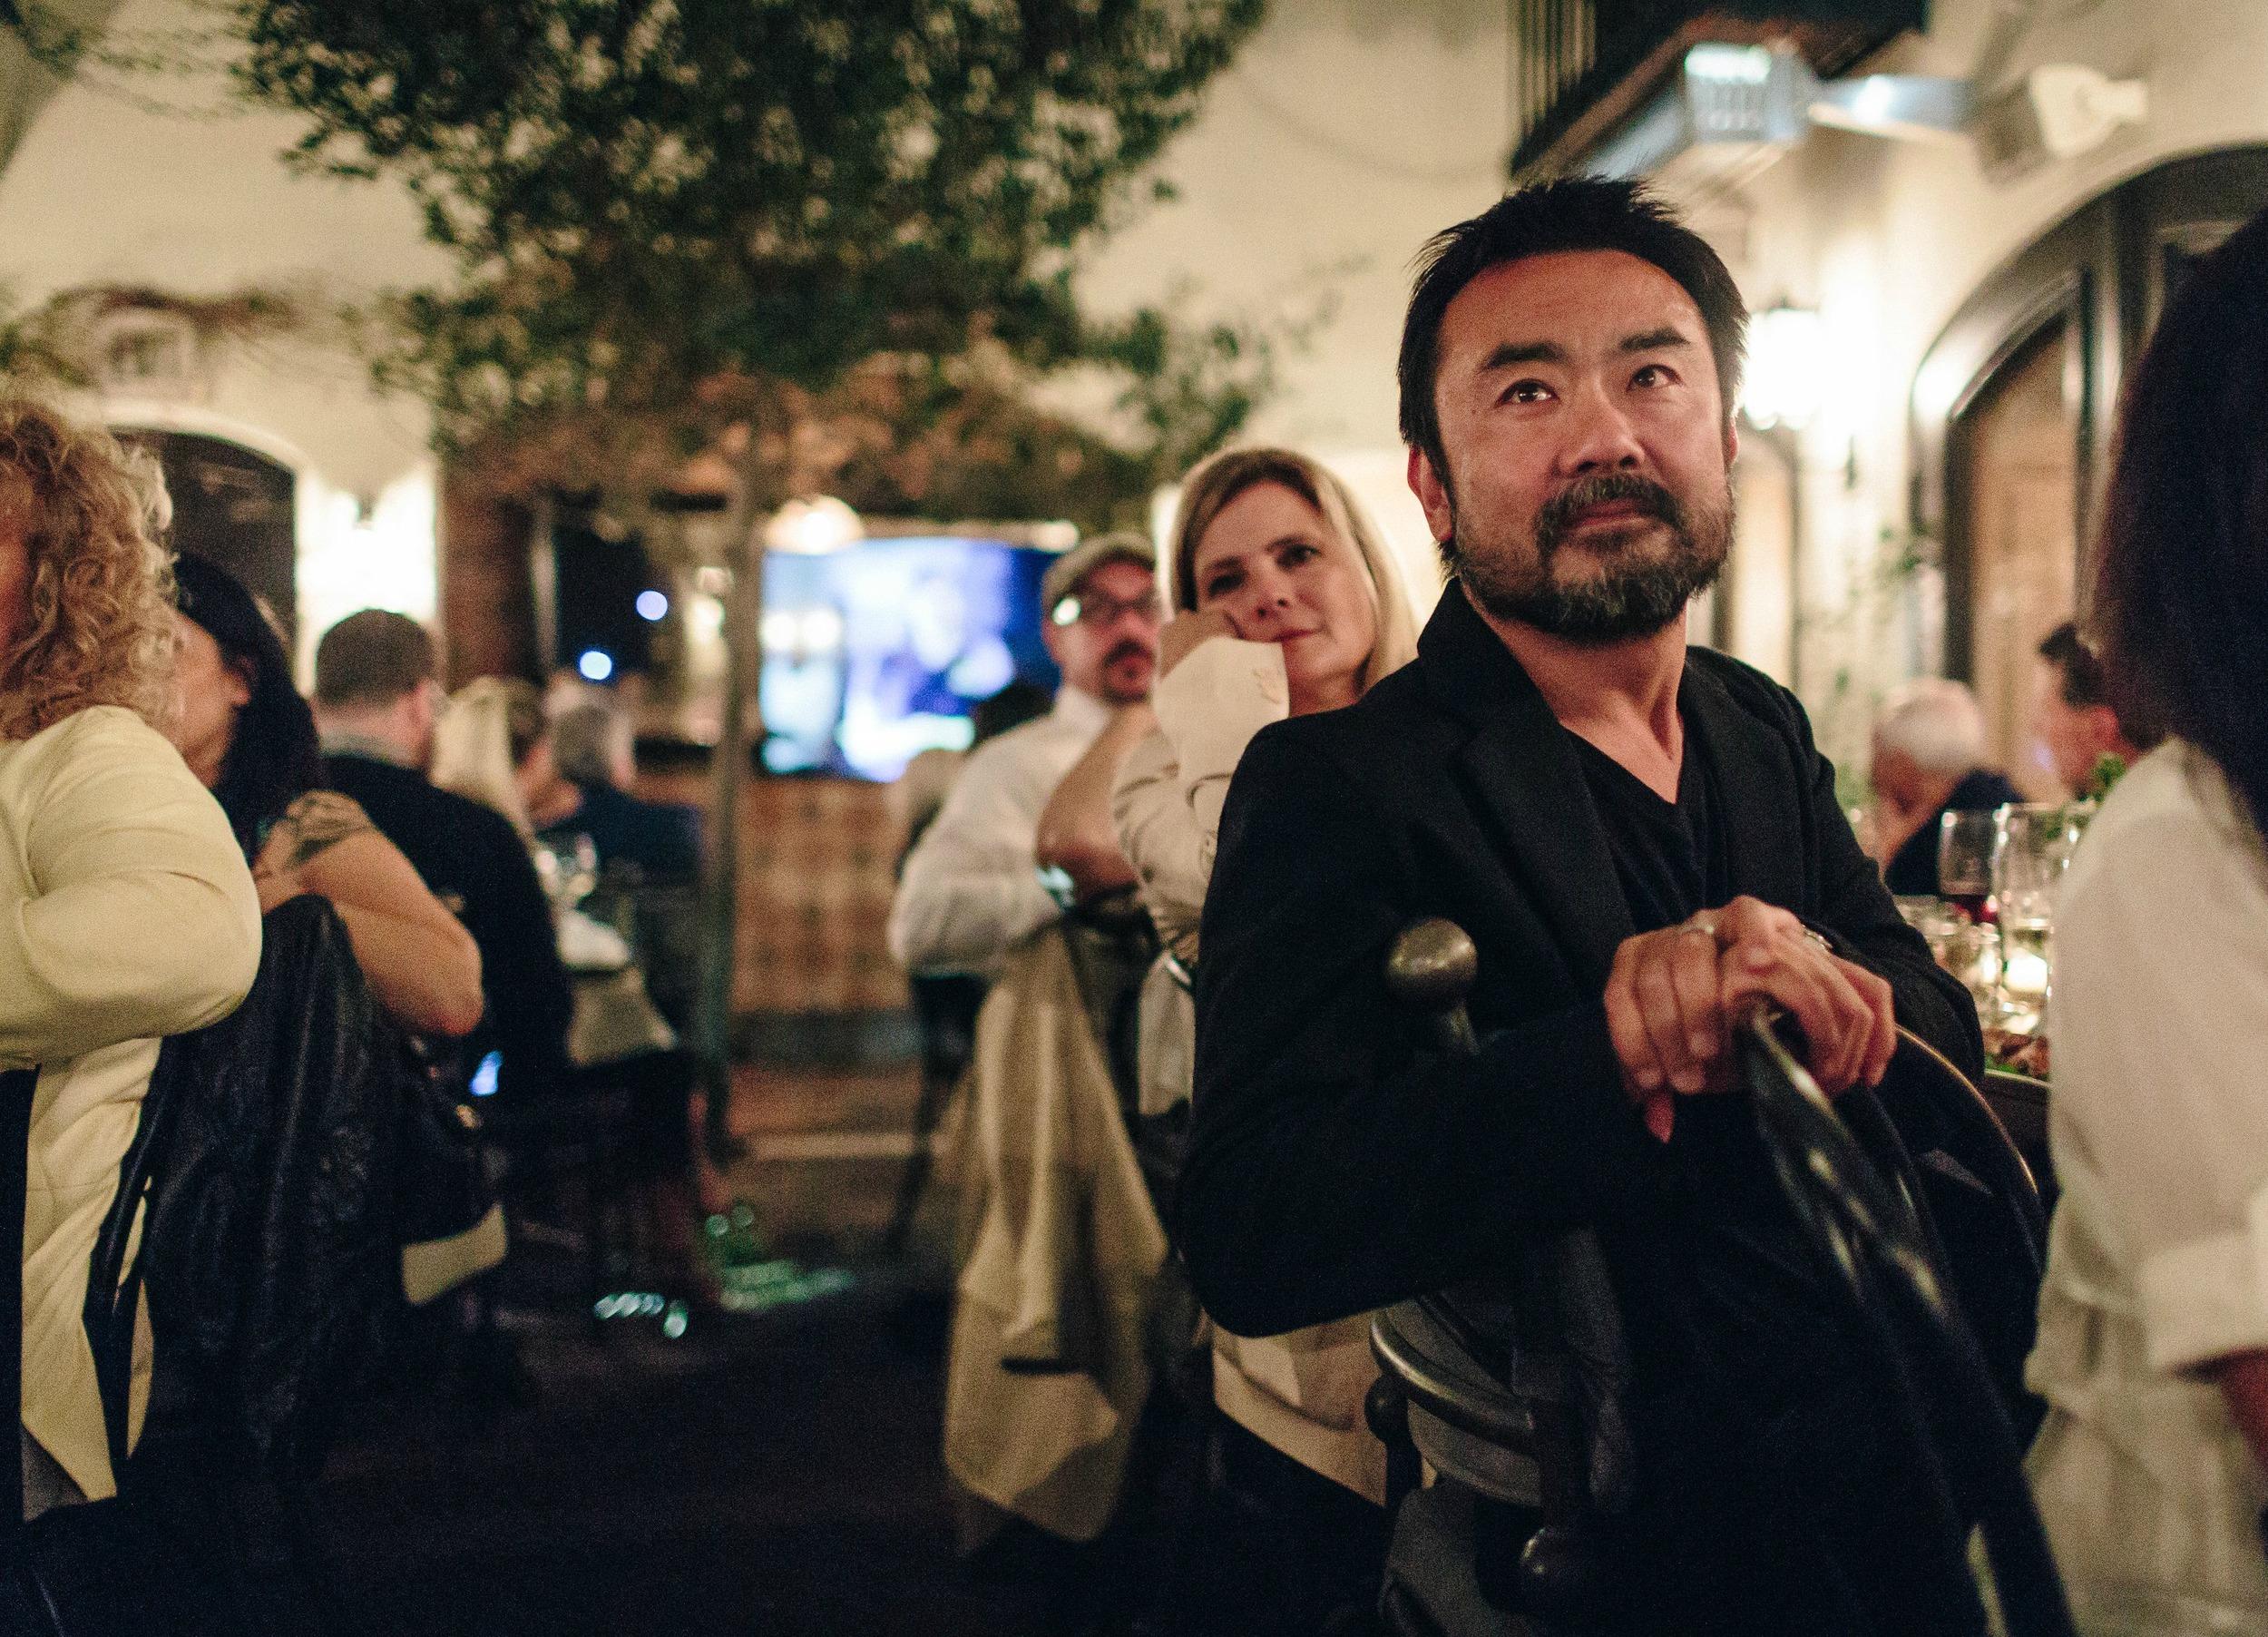 Takashi Yanai and Lizzie Dinkel